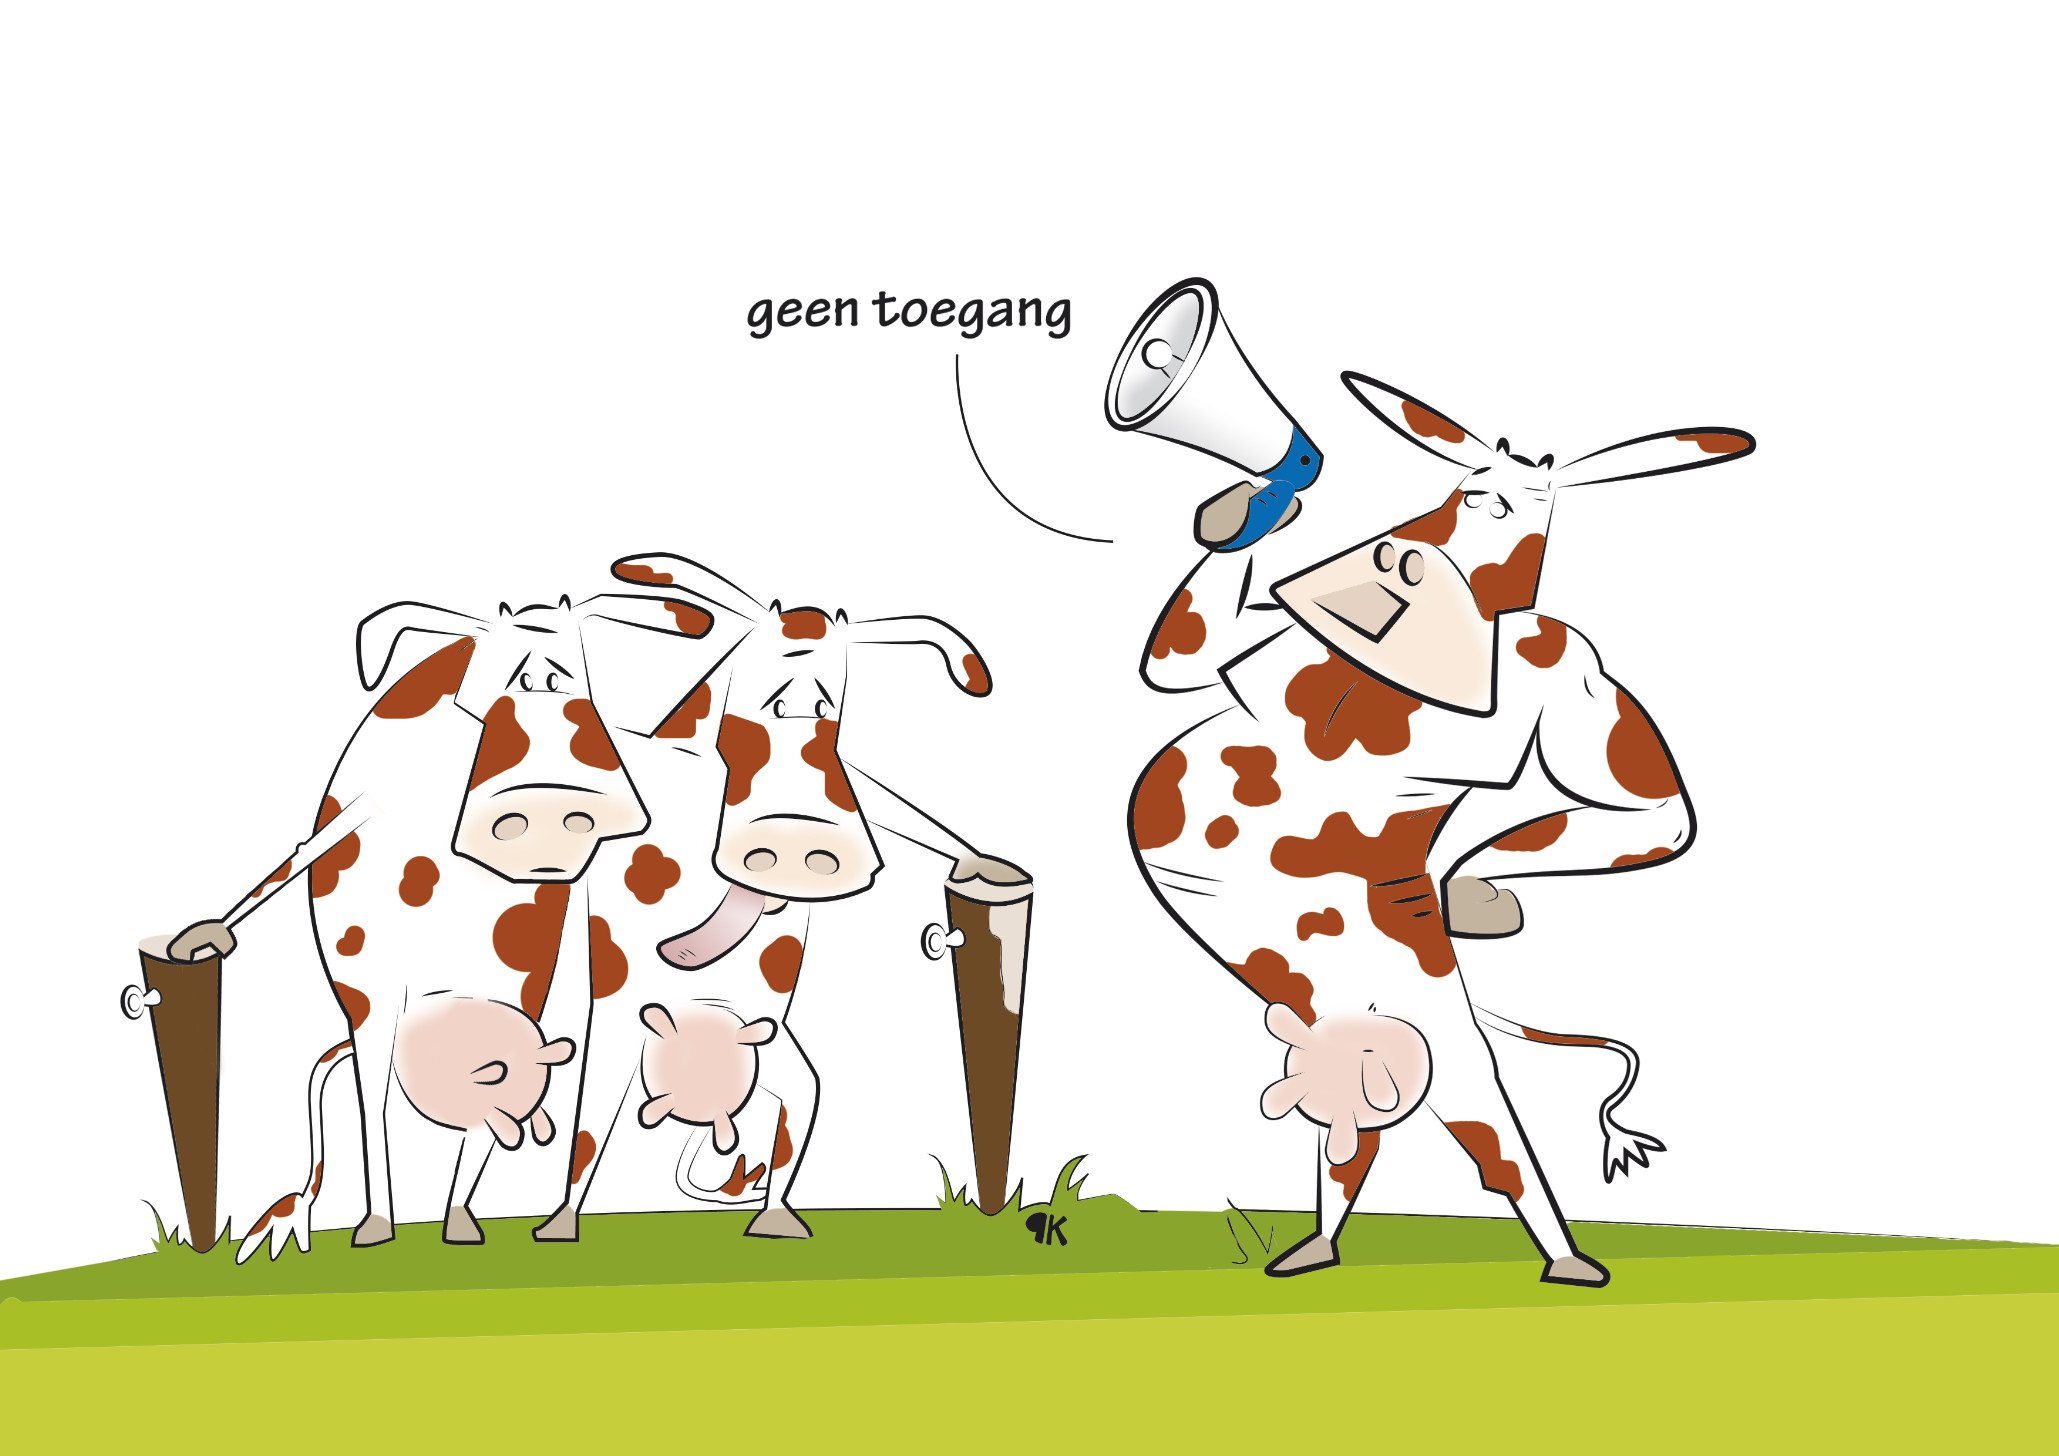 TopBodem-deelnemers zetten groenbemesters doelgericht in